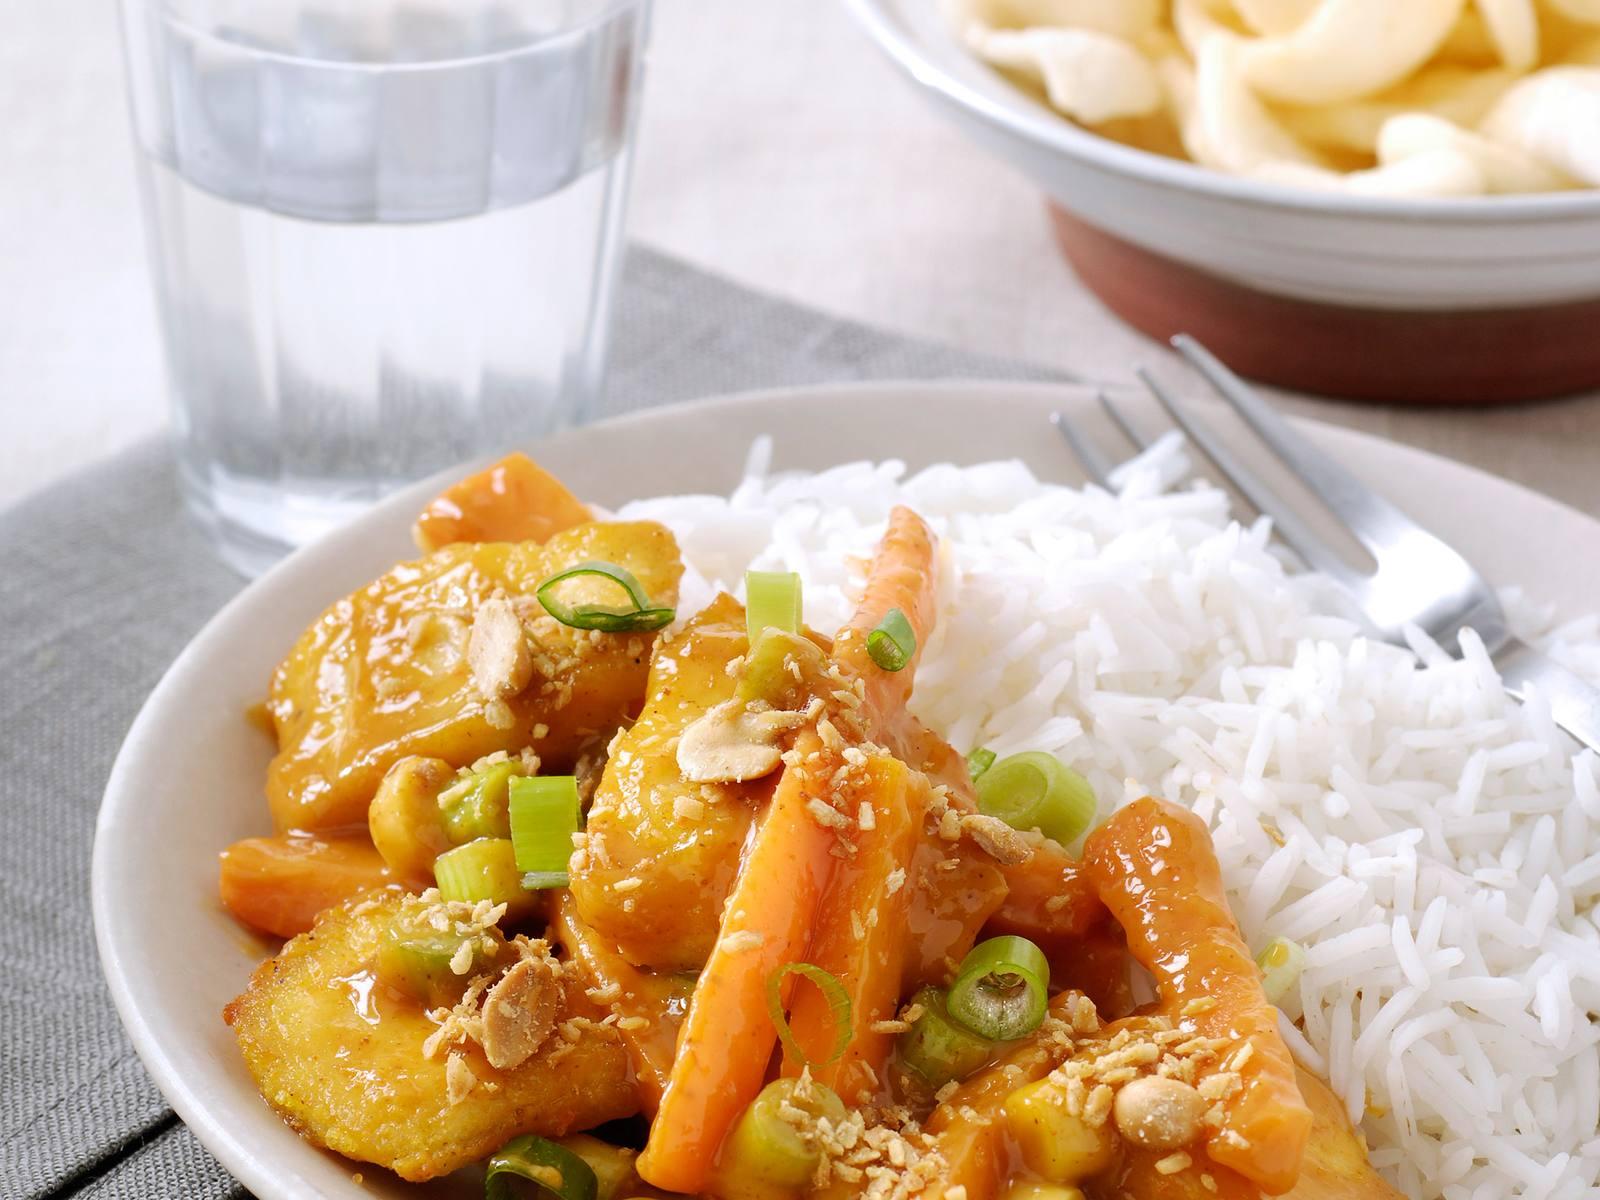 Thaise Rode viscurry met lente uitjes en Seroendeng